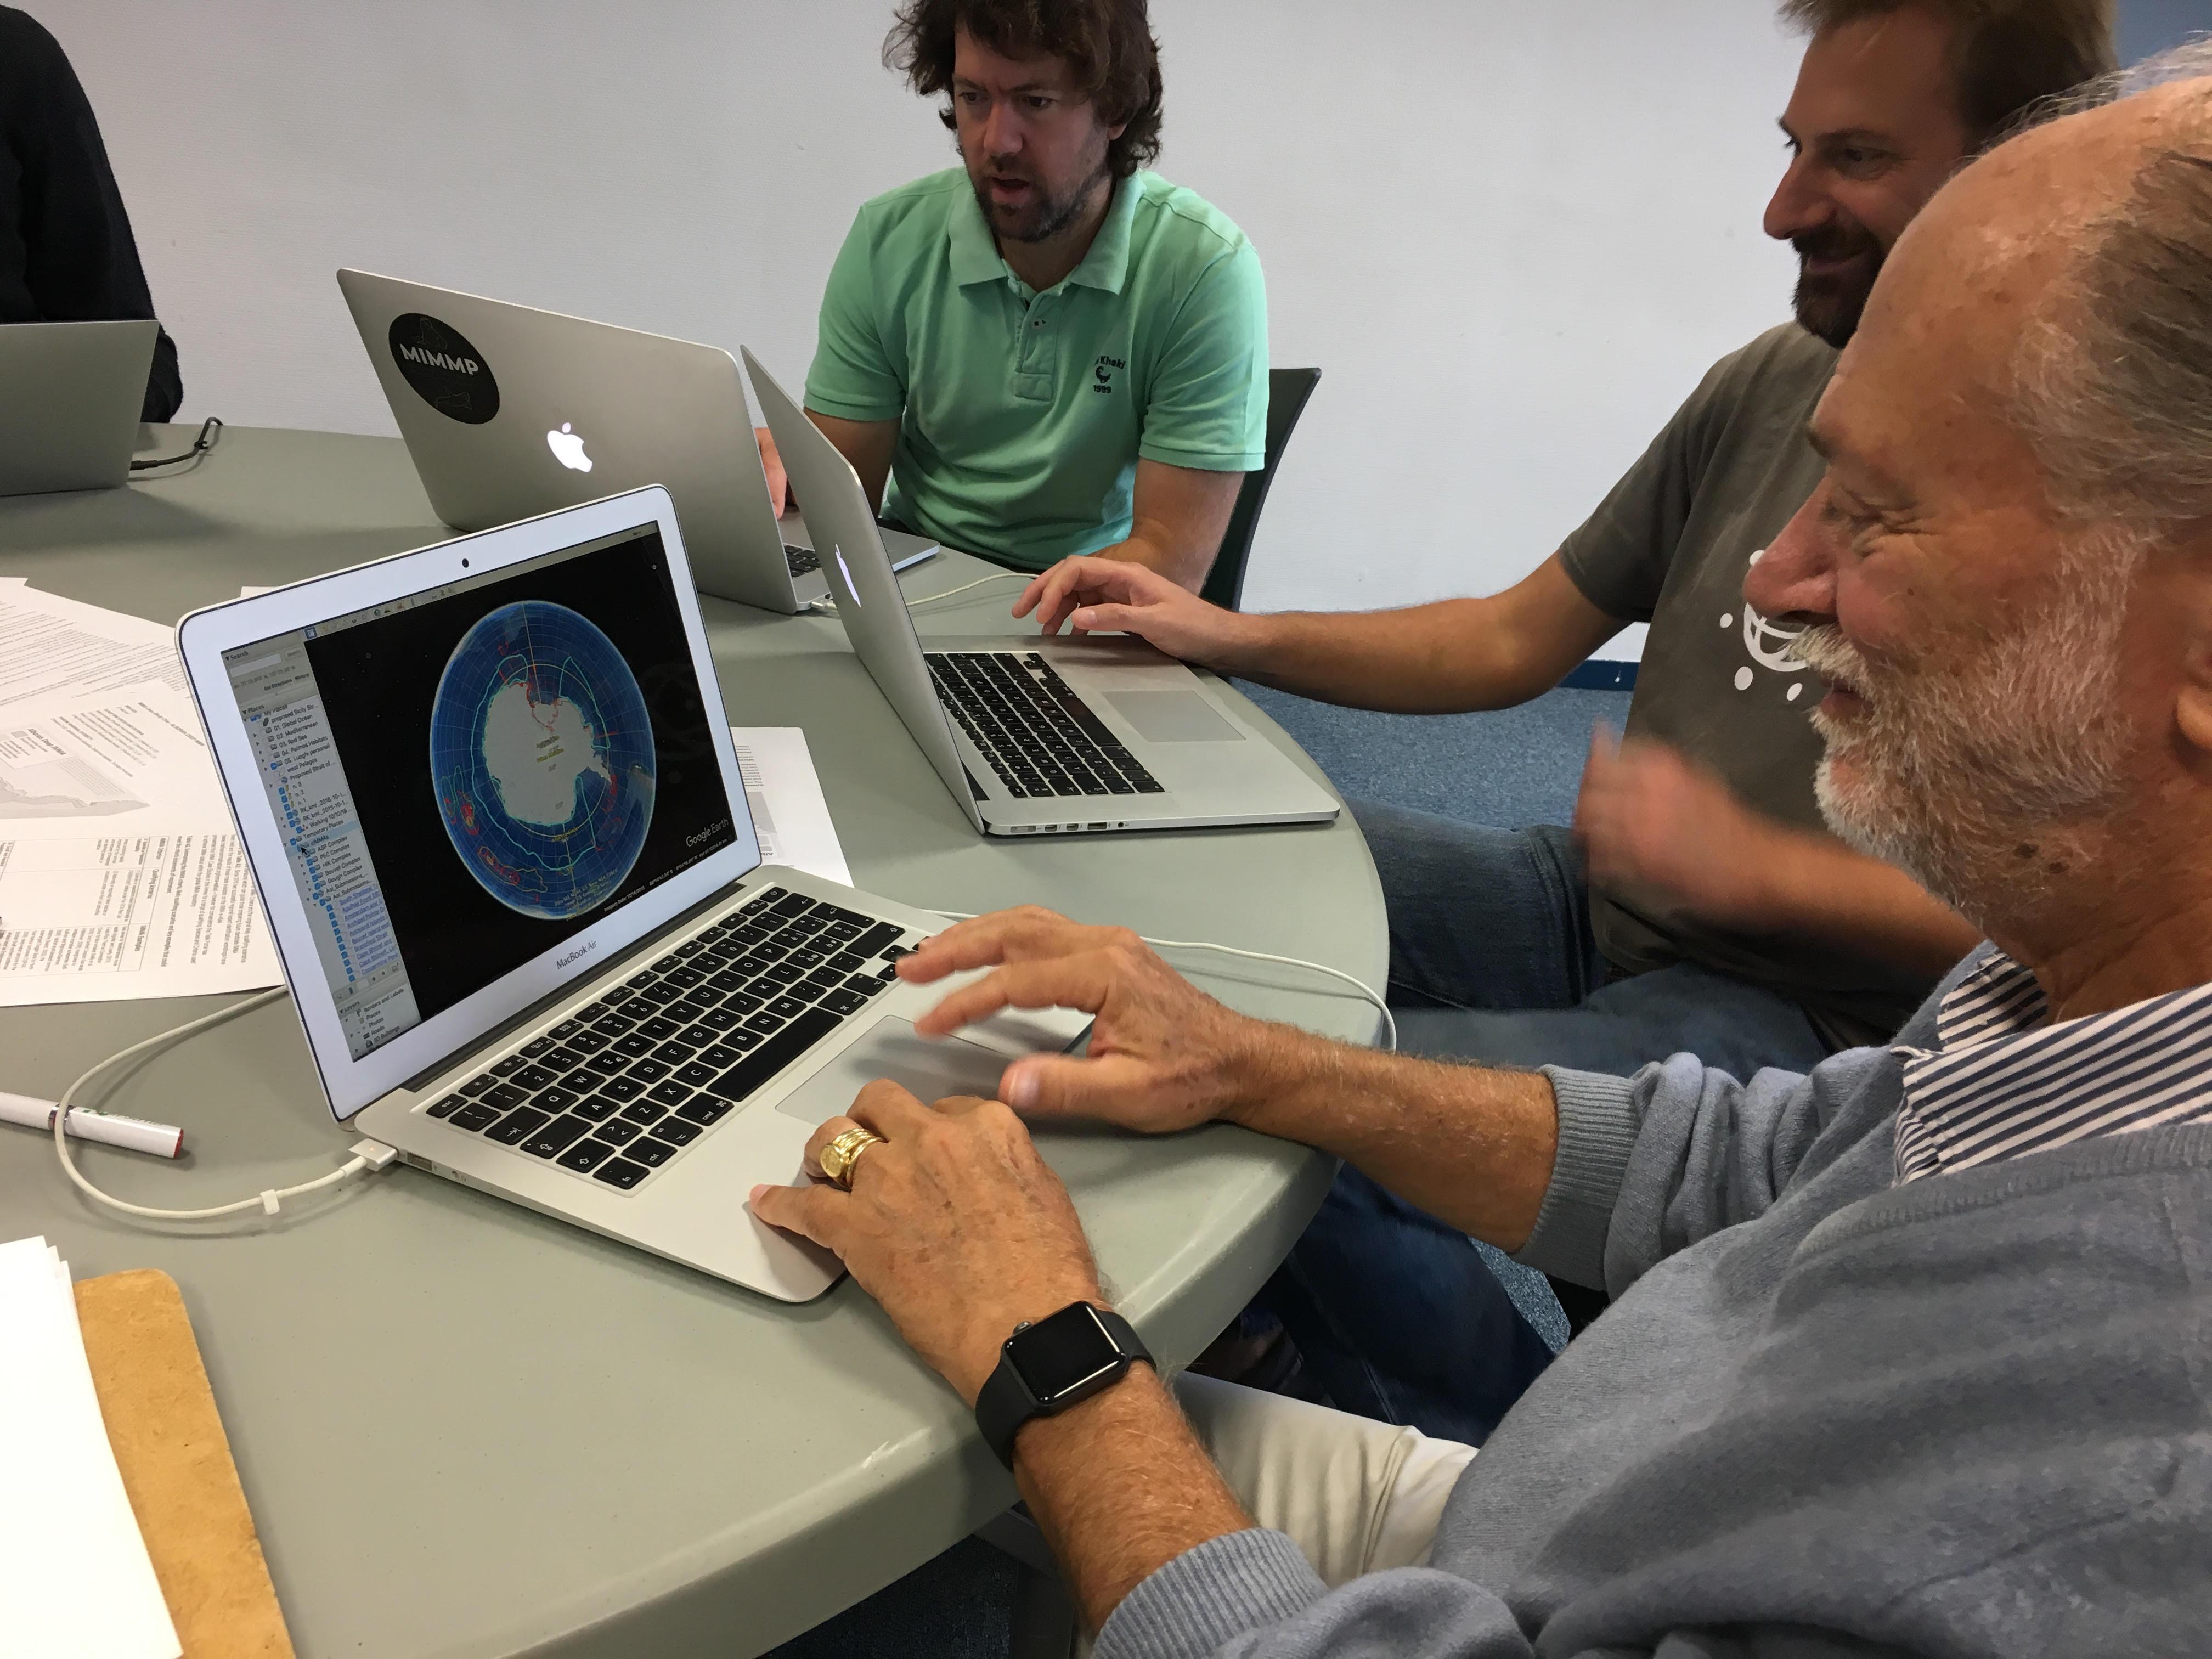 Extended Southern Ocean IMMA workshop in Brest, France